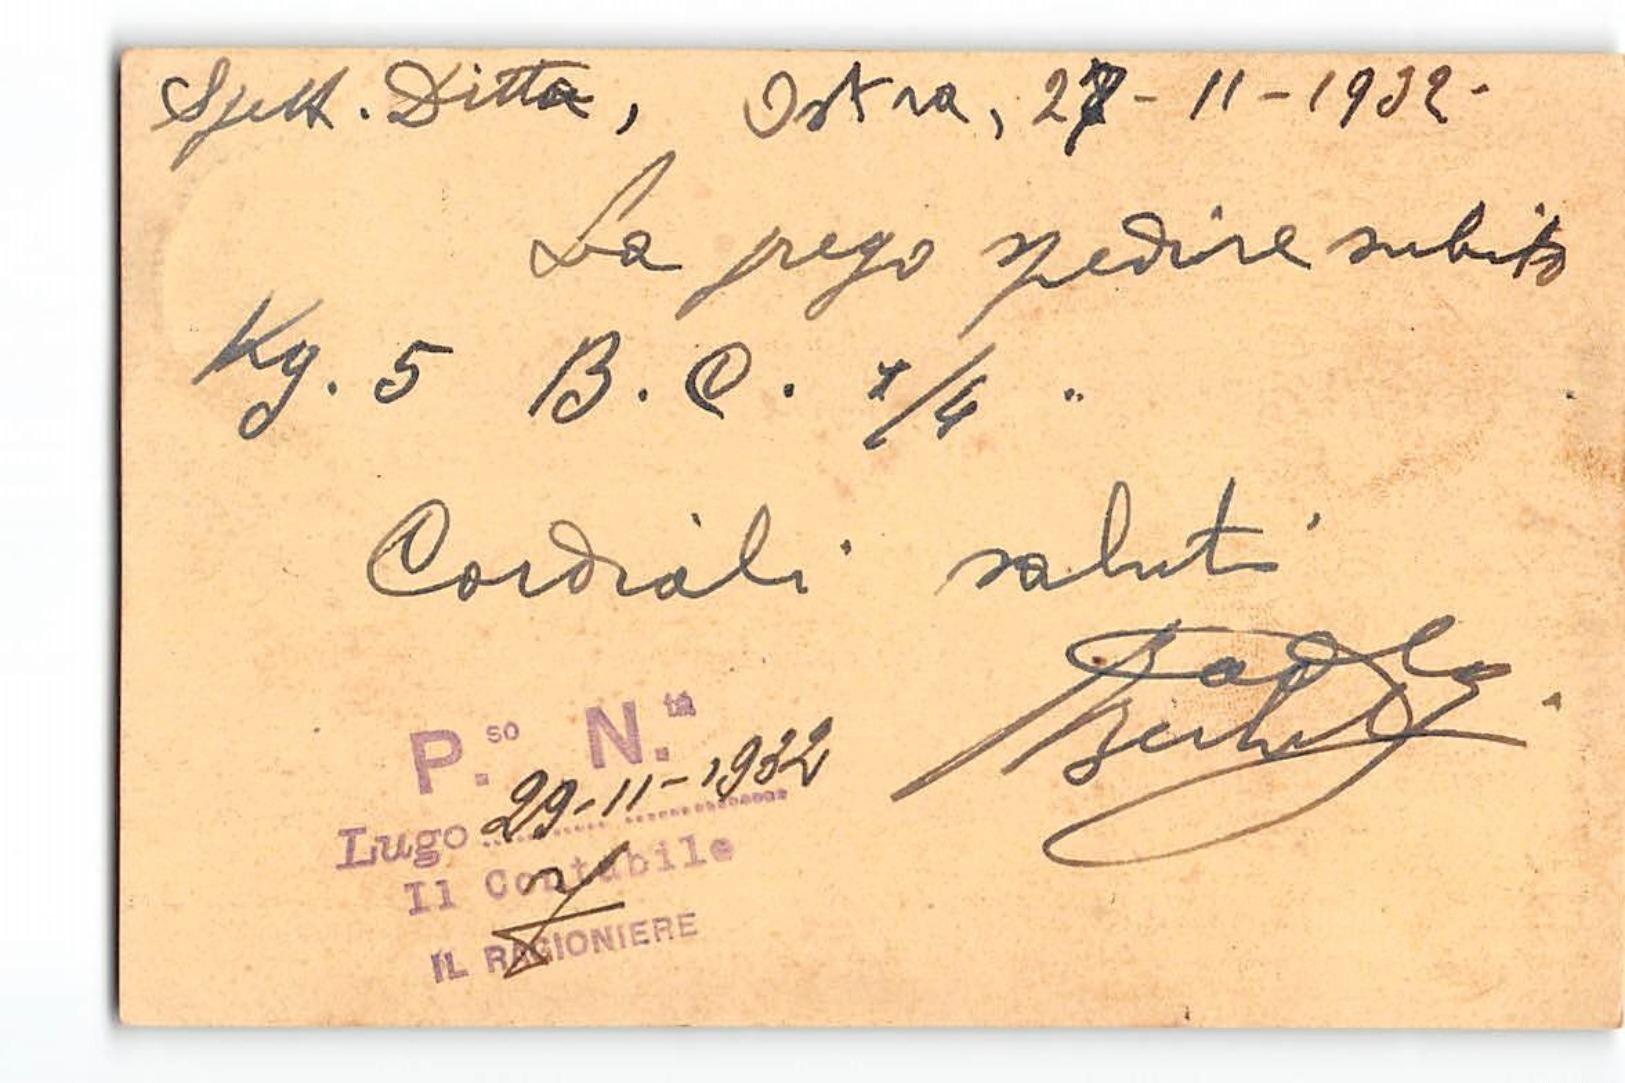 B517 OSTRA ROSSI BERLUTI ARMERIA X LUGO - 1900-44 Victor Emmanuel III